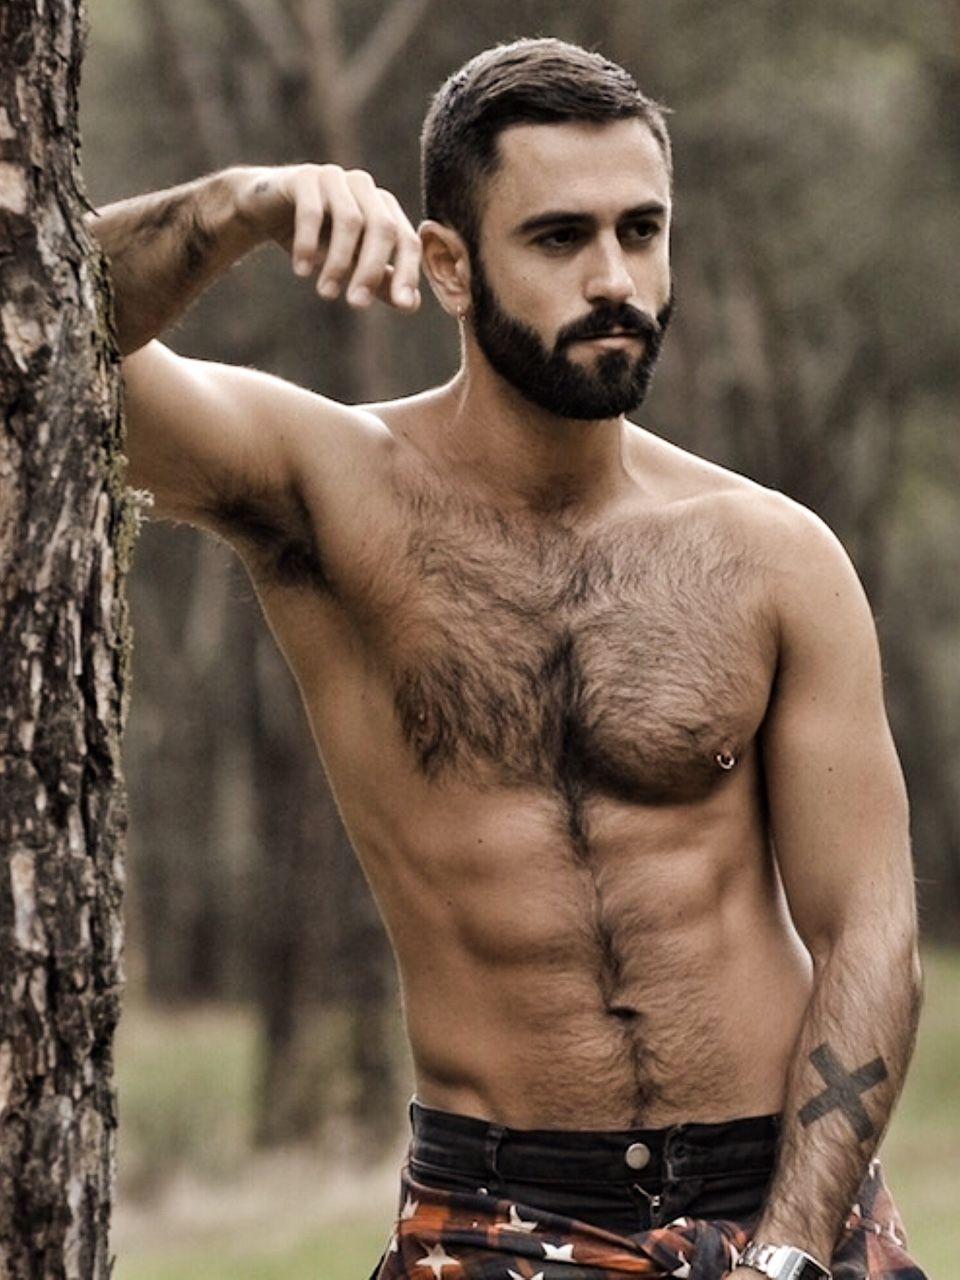 Hot model nude erotica